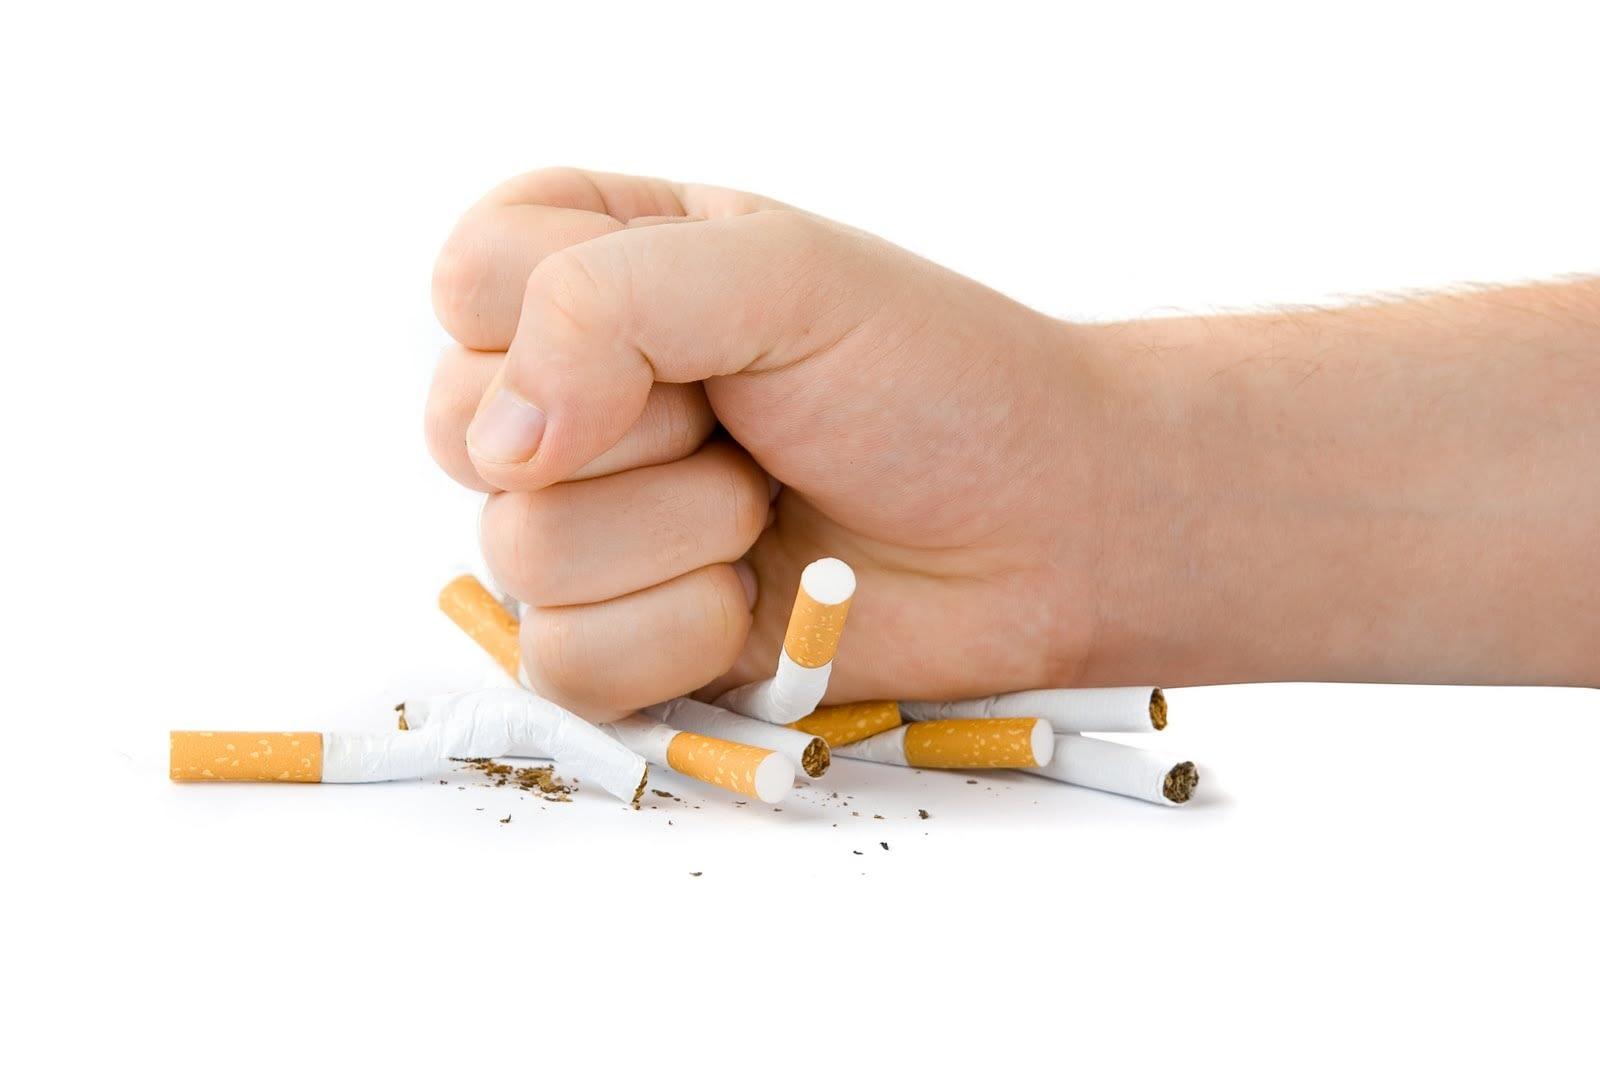 crushing cigarettes